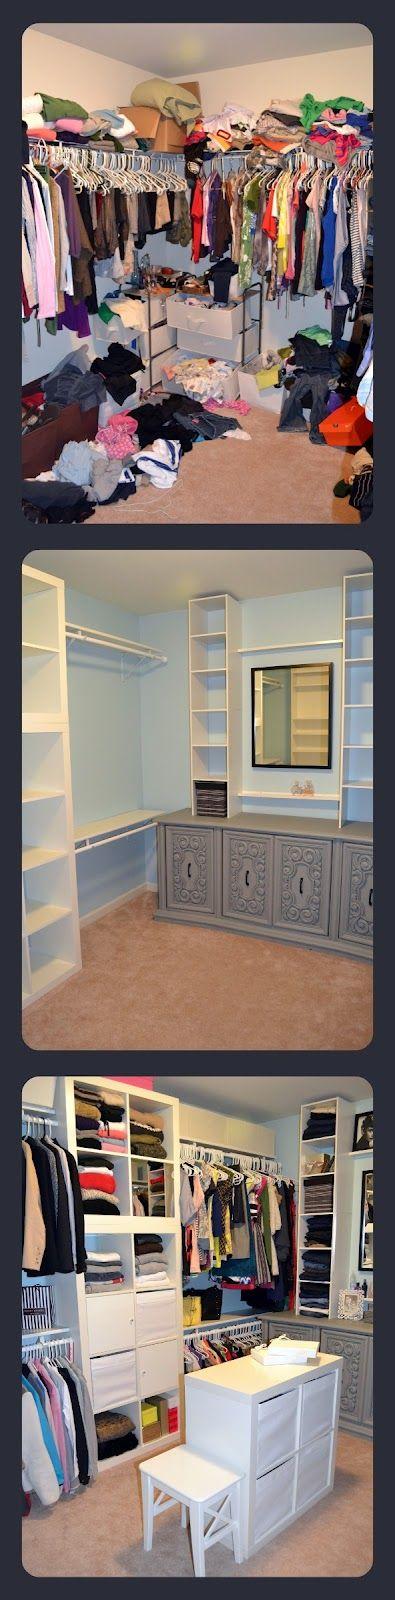 closet+makeover+with+ikea+expedit+cheap+closet+buit+ins.jpg 395×1,600 pixels